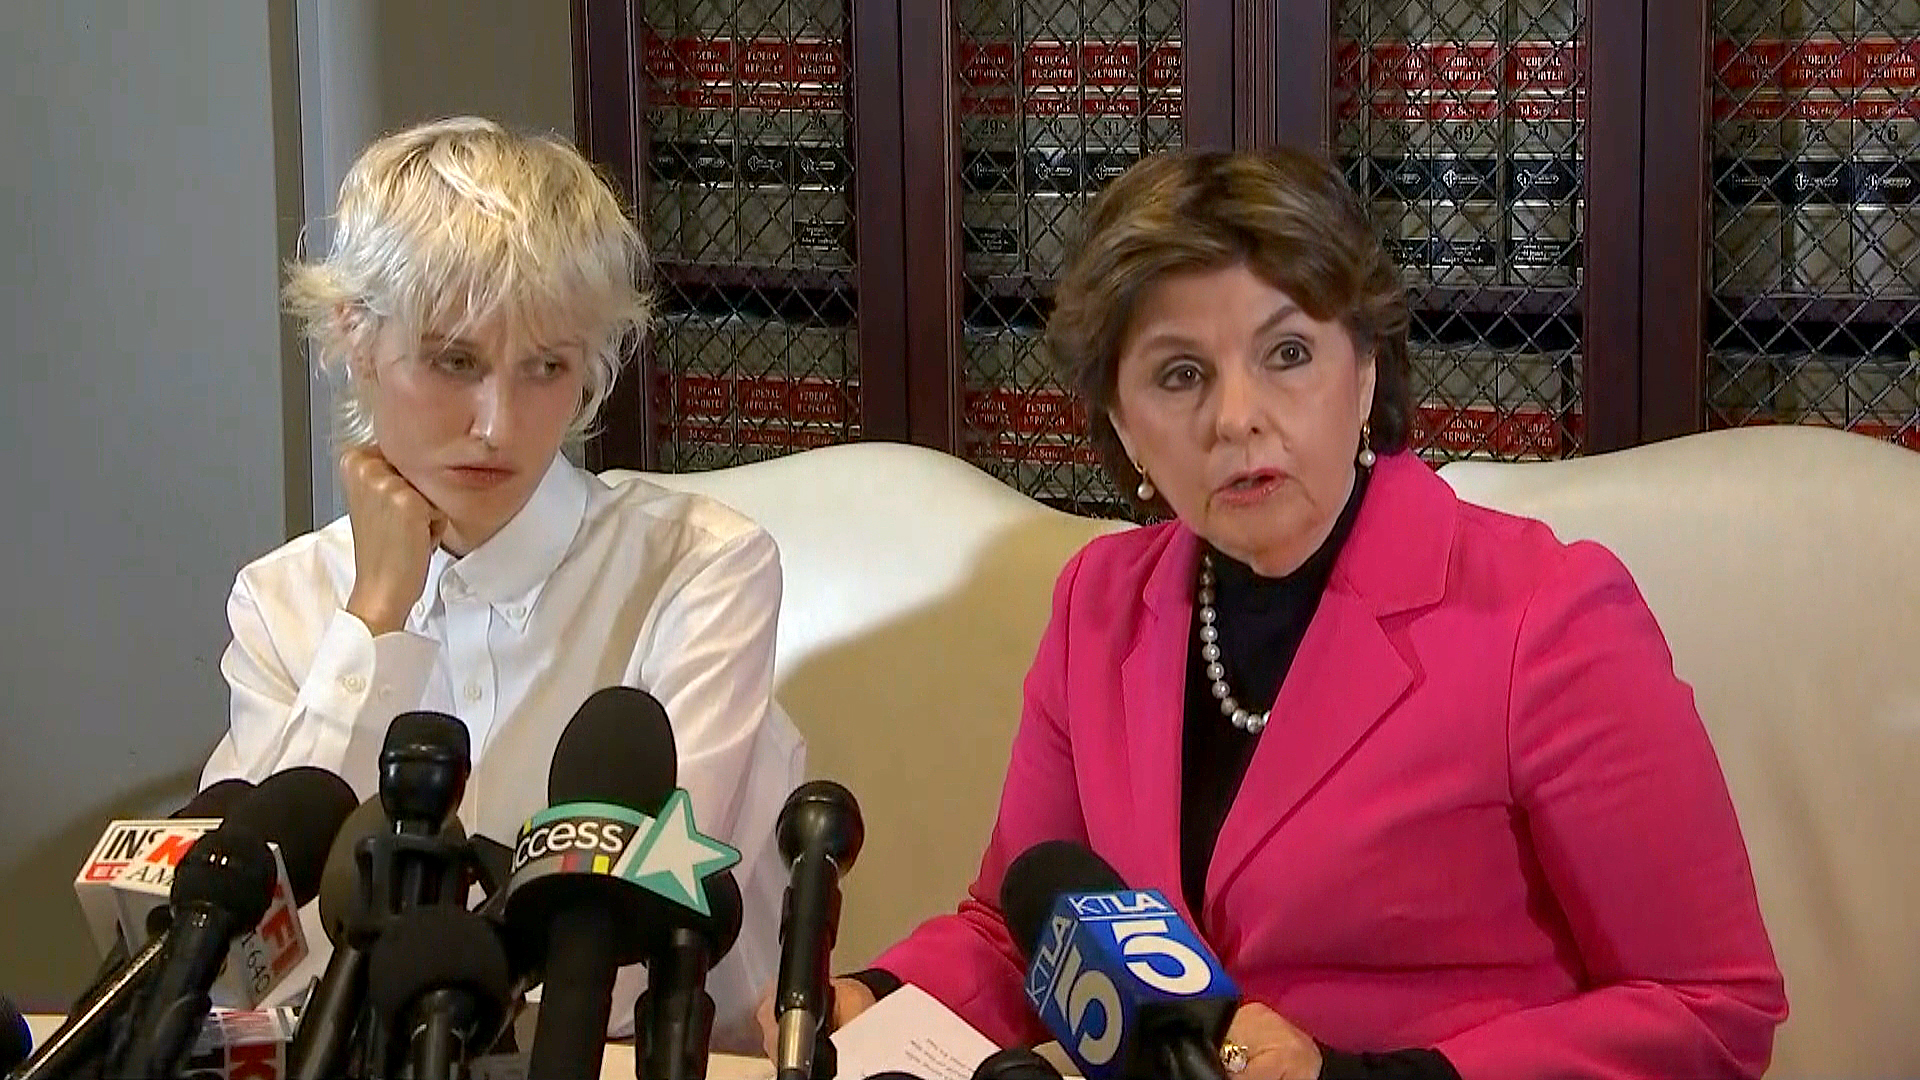 New Jeffrey Epstein Accuser Sues His Estate Calls On Prince